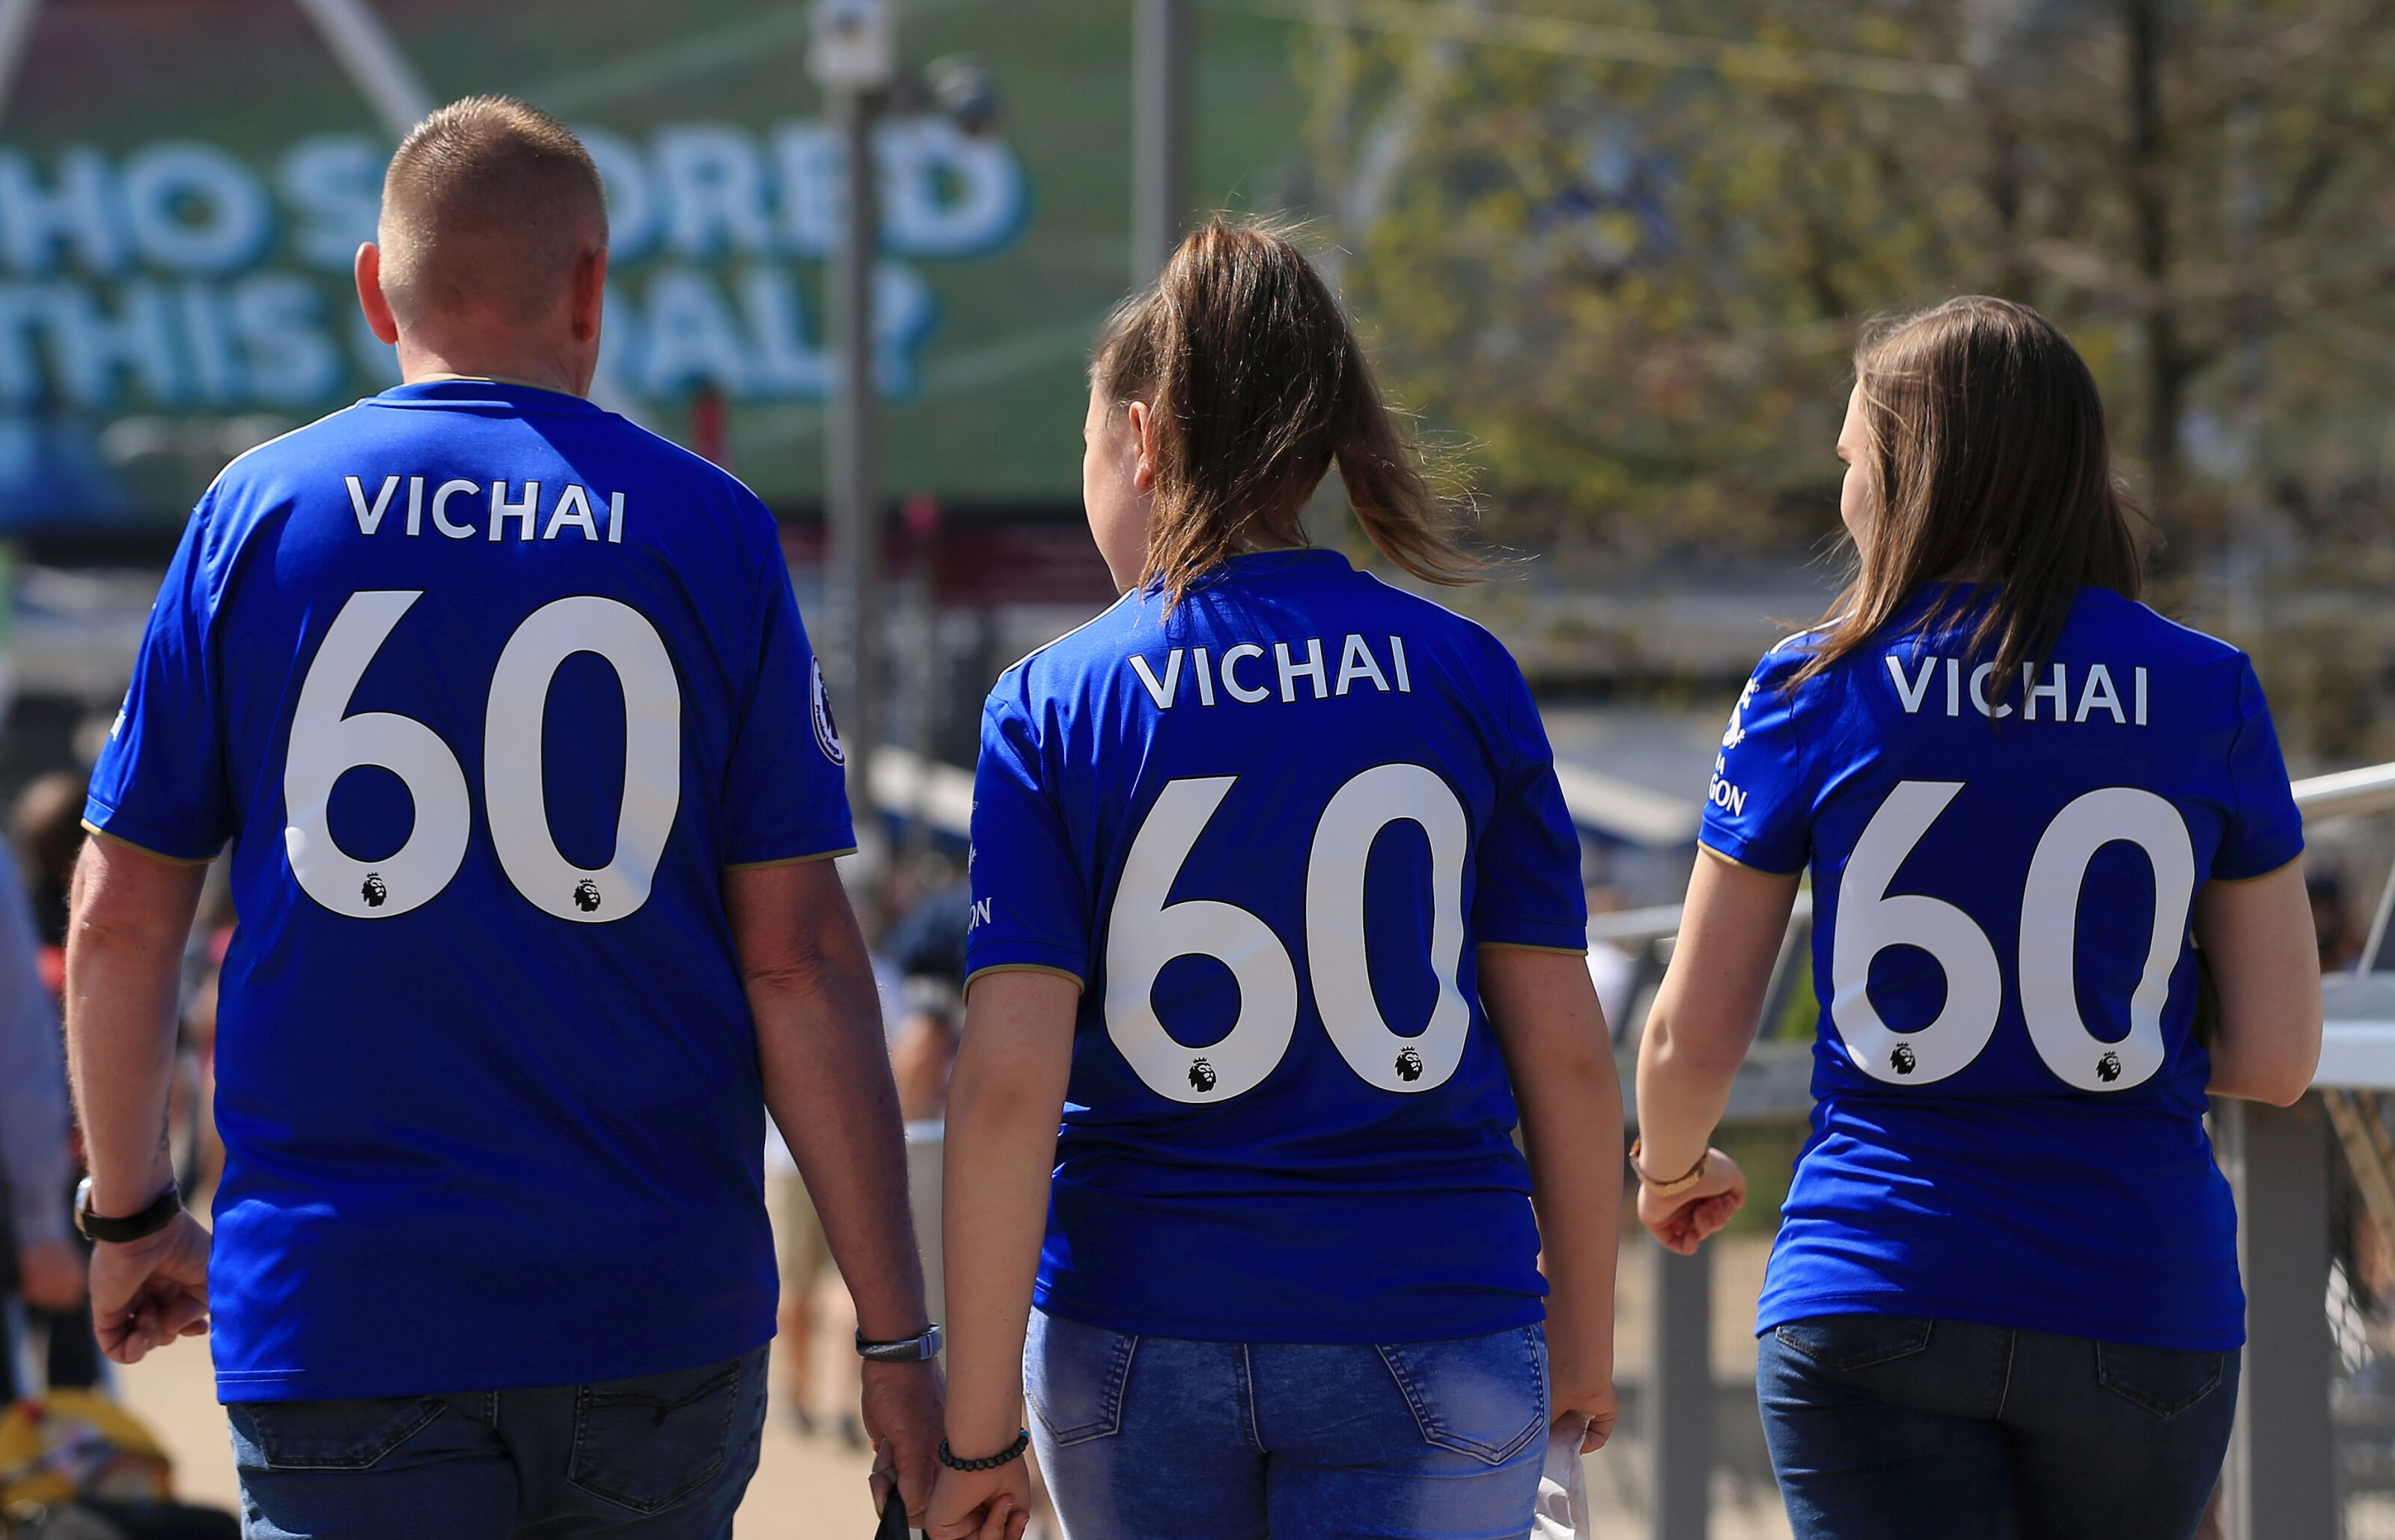 Leicester City to honour Vichai Srivaddhanaprabha legacy at King Power Stadium